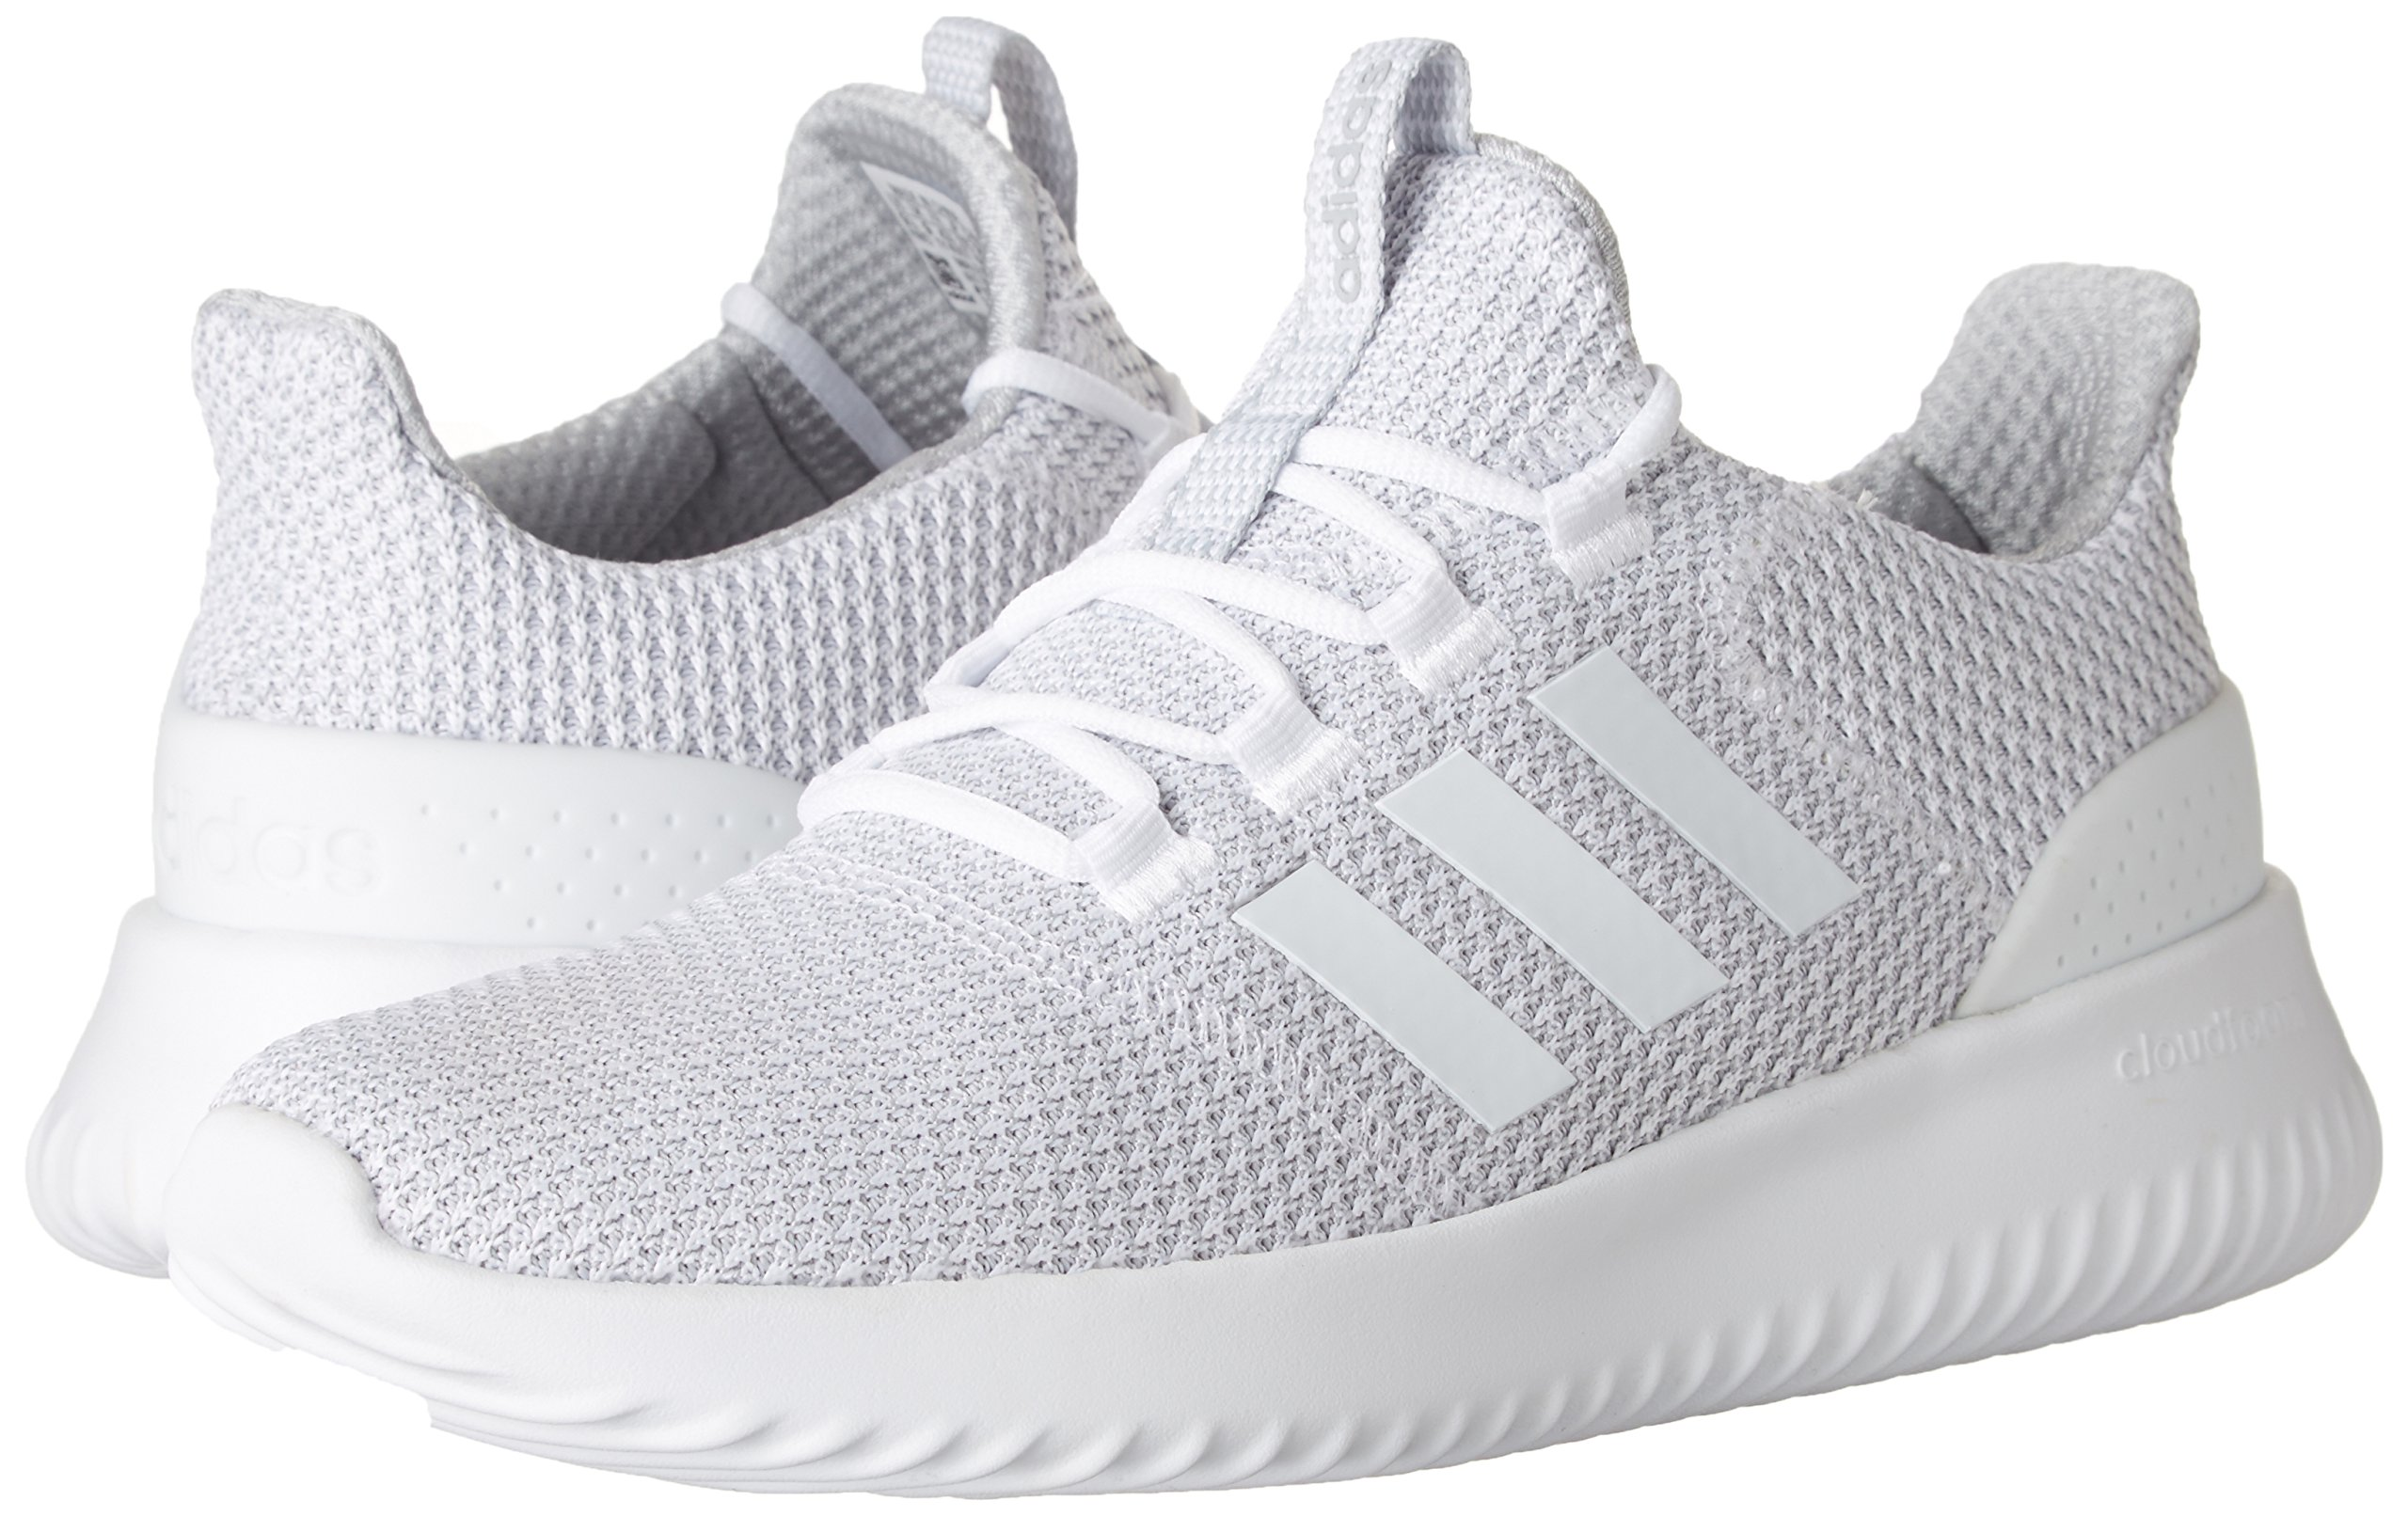 b9168a33a adidas Men s Cloudfoam Ultimate Running Shoe